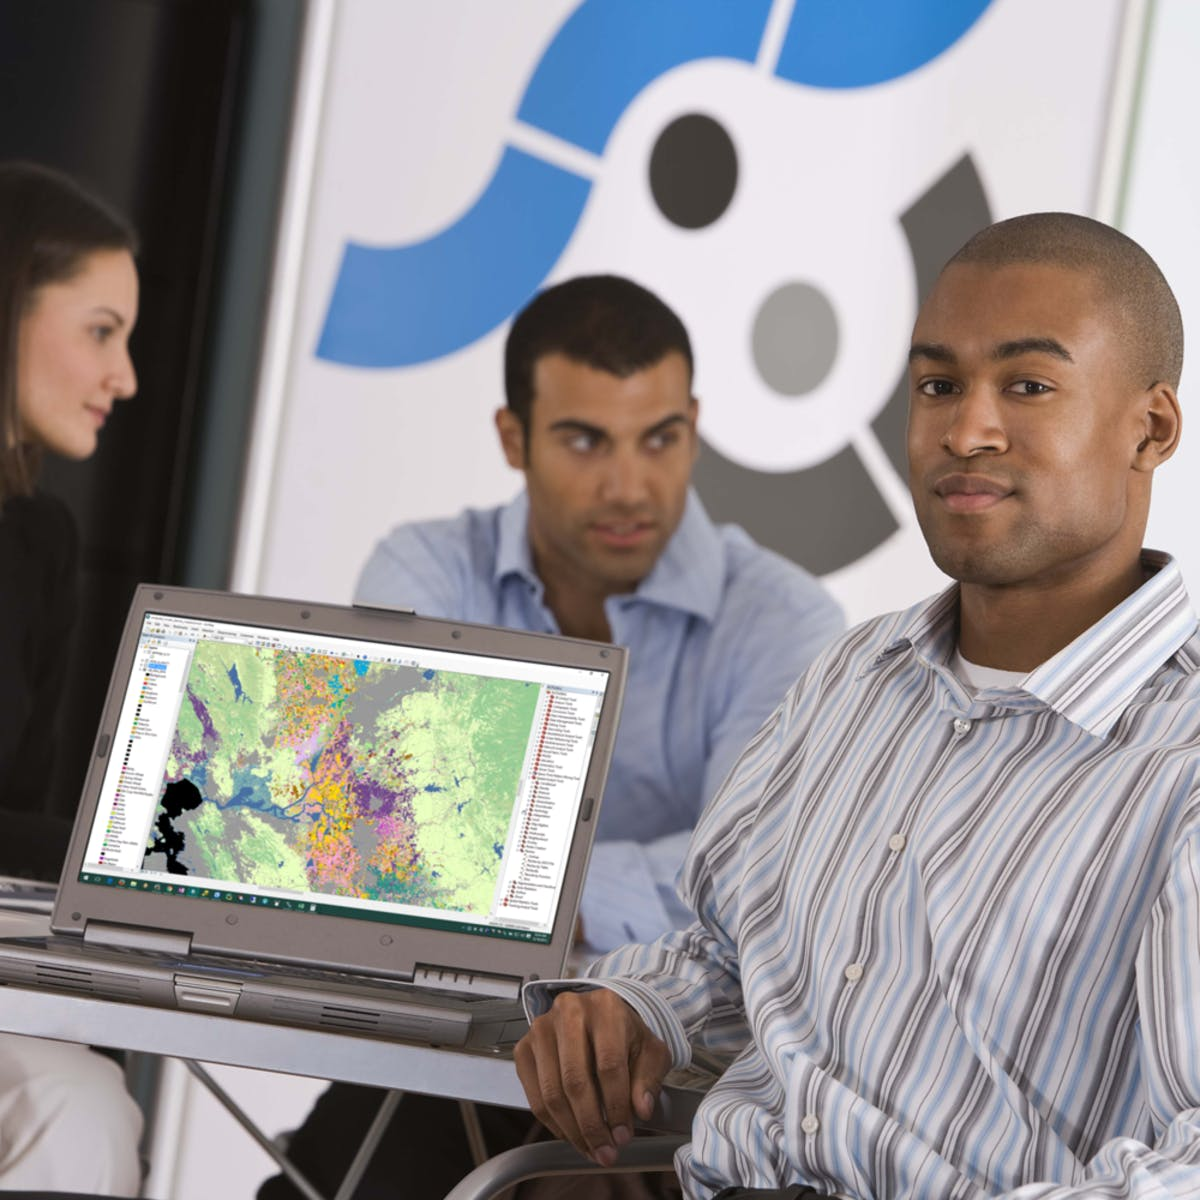 Geospatial Analysis Project